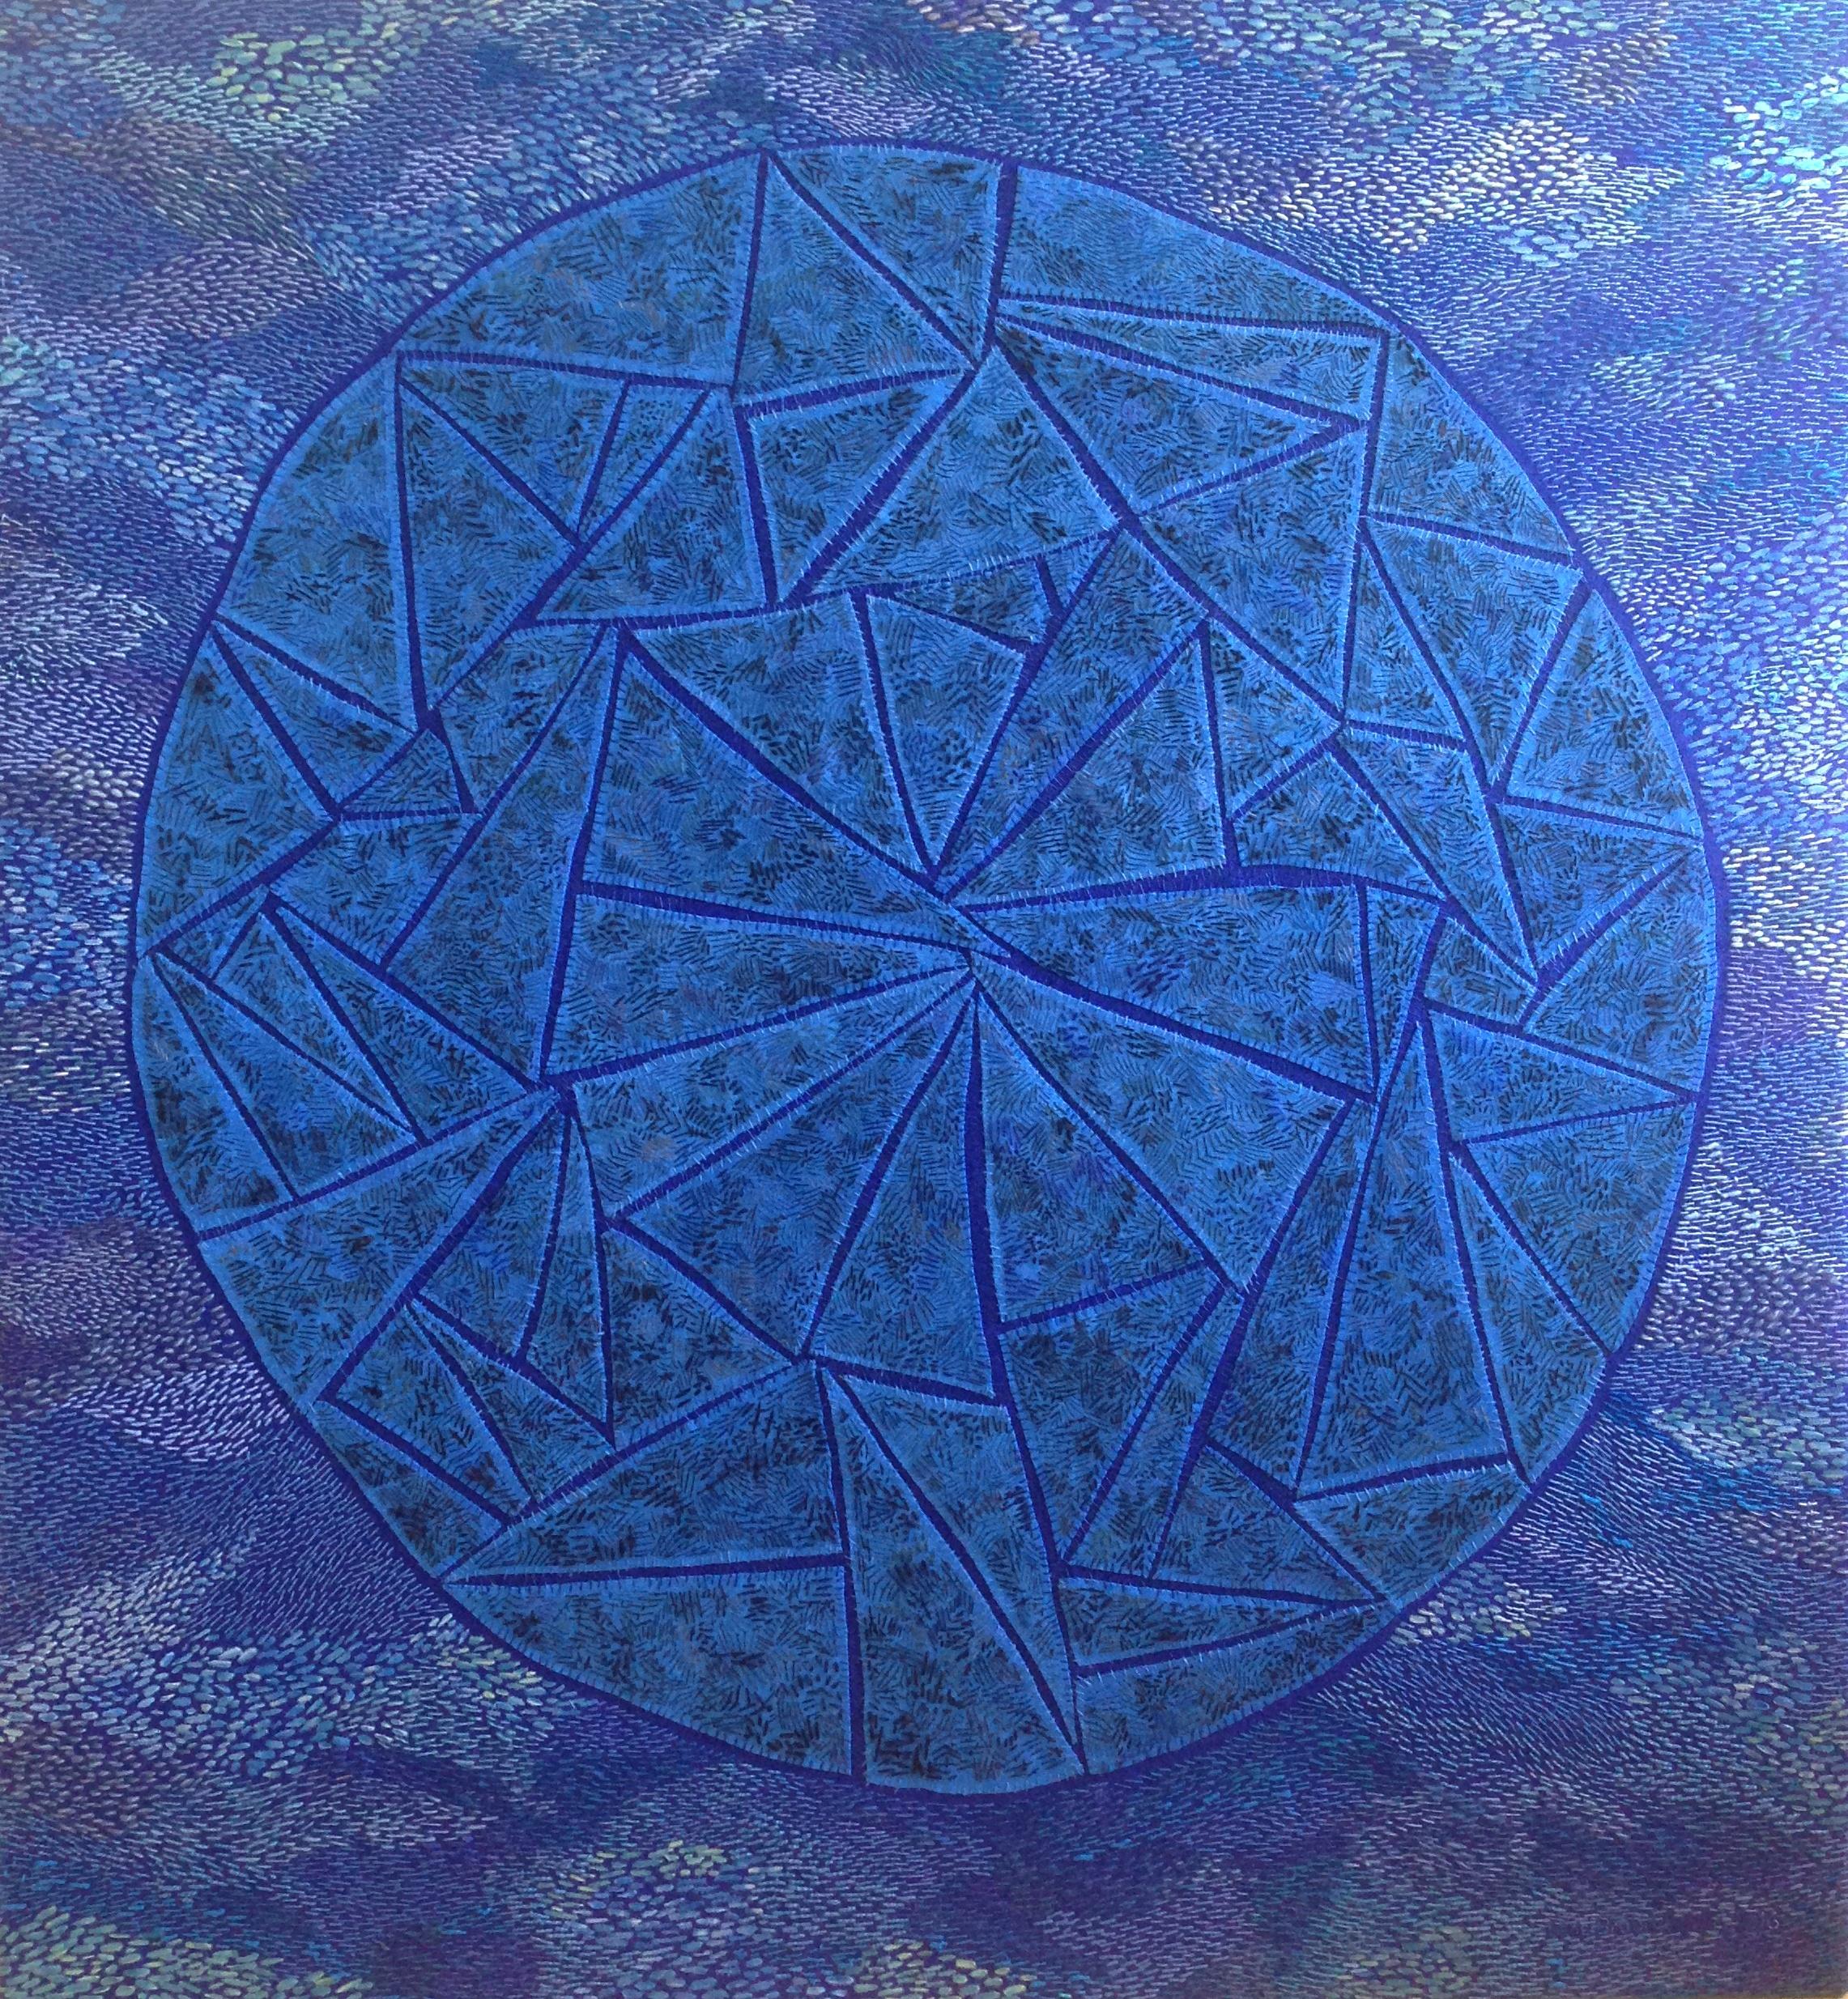 Sort Sol (Black Sun) Blue Moon